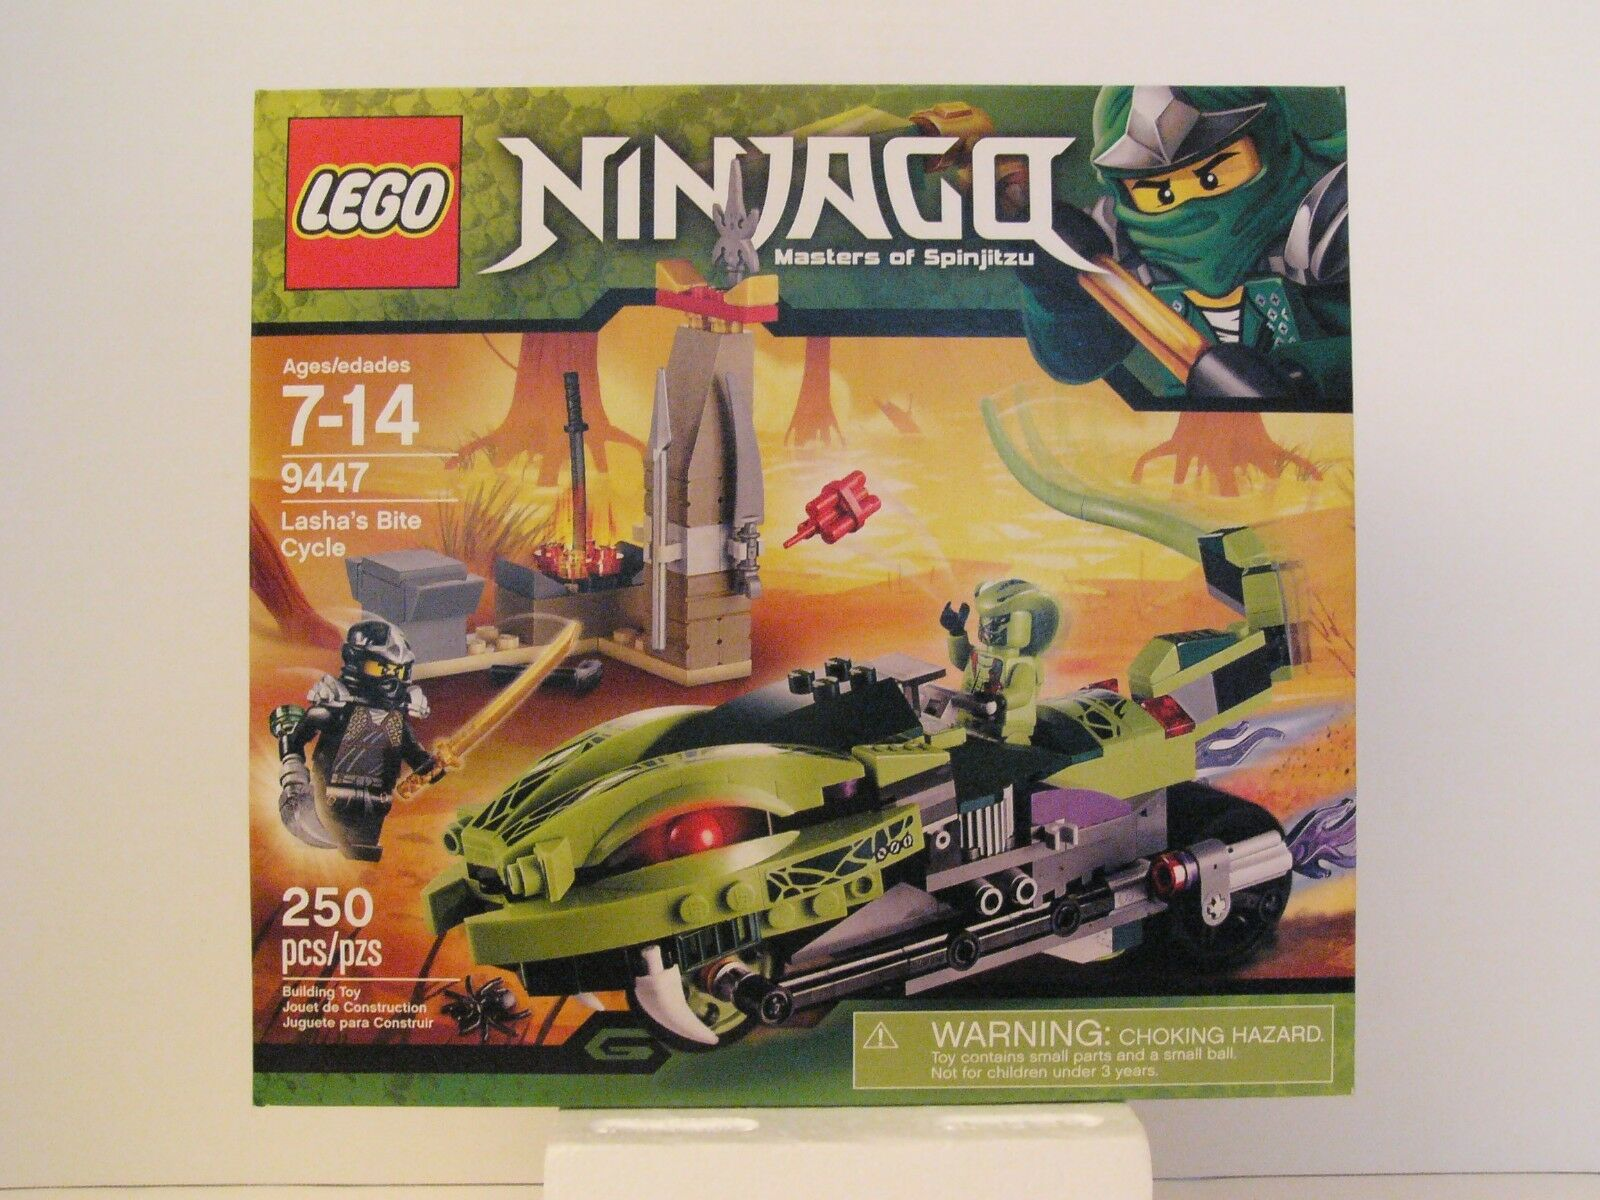 LEGO Ninjago 9447 Lasha's Bite Cycle, Nuovo and Factory Sealed